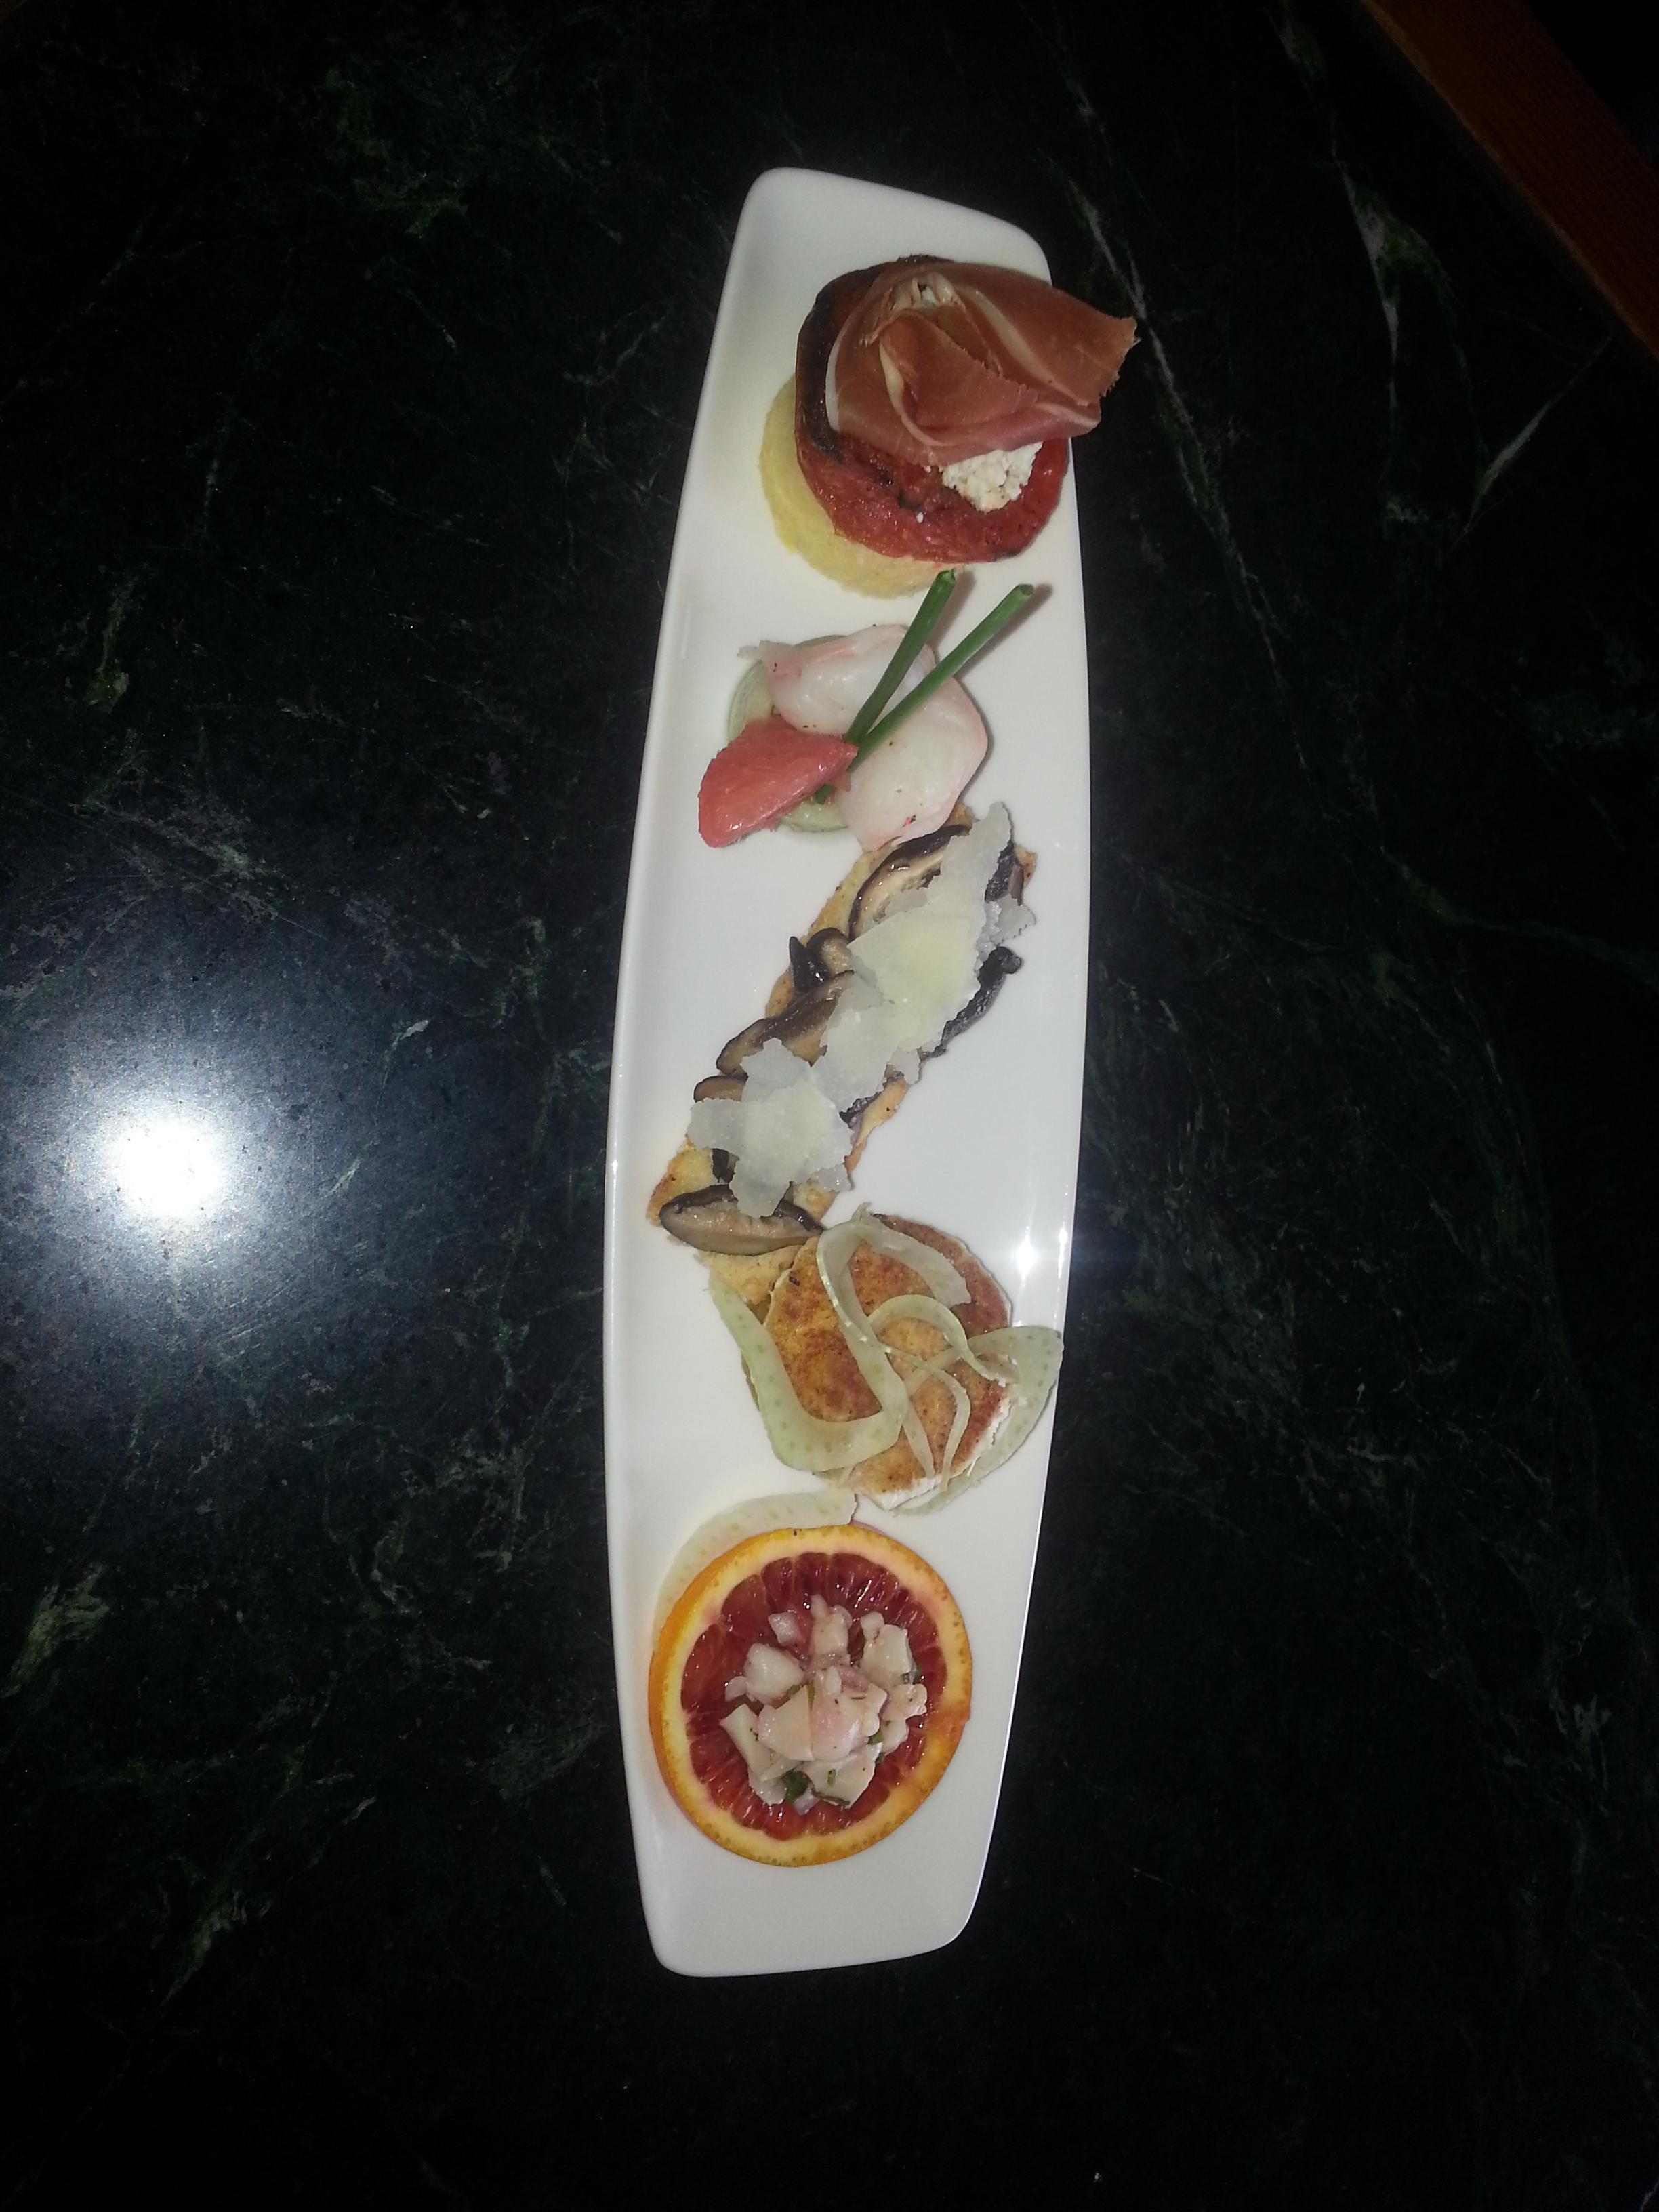 Food & Wine Pairing for Sebastiani